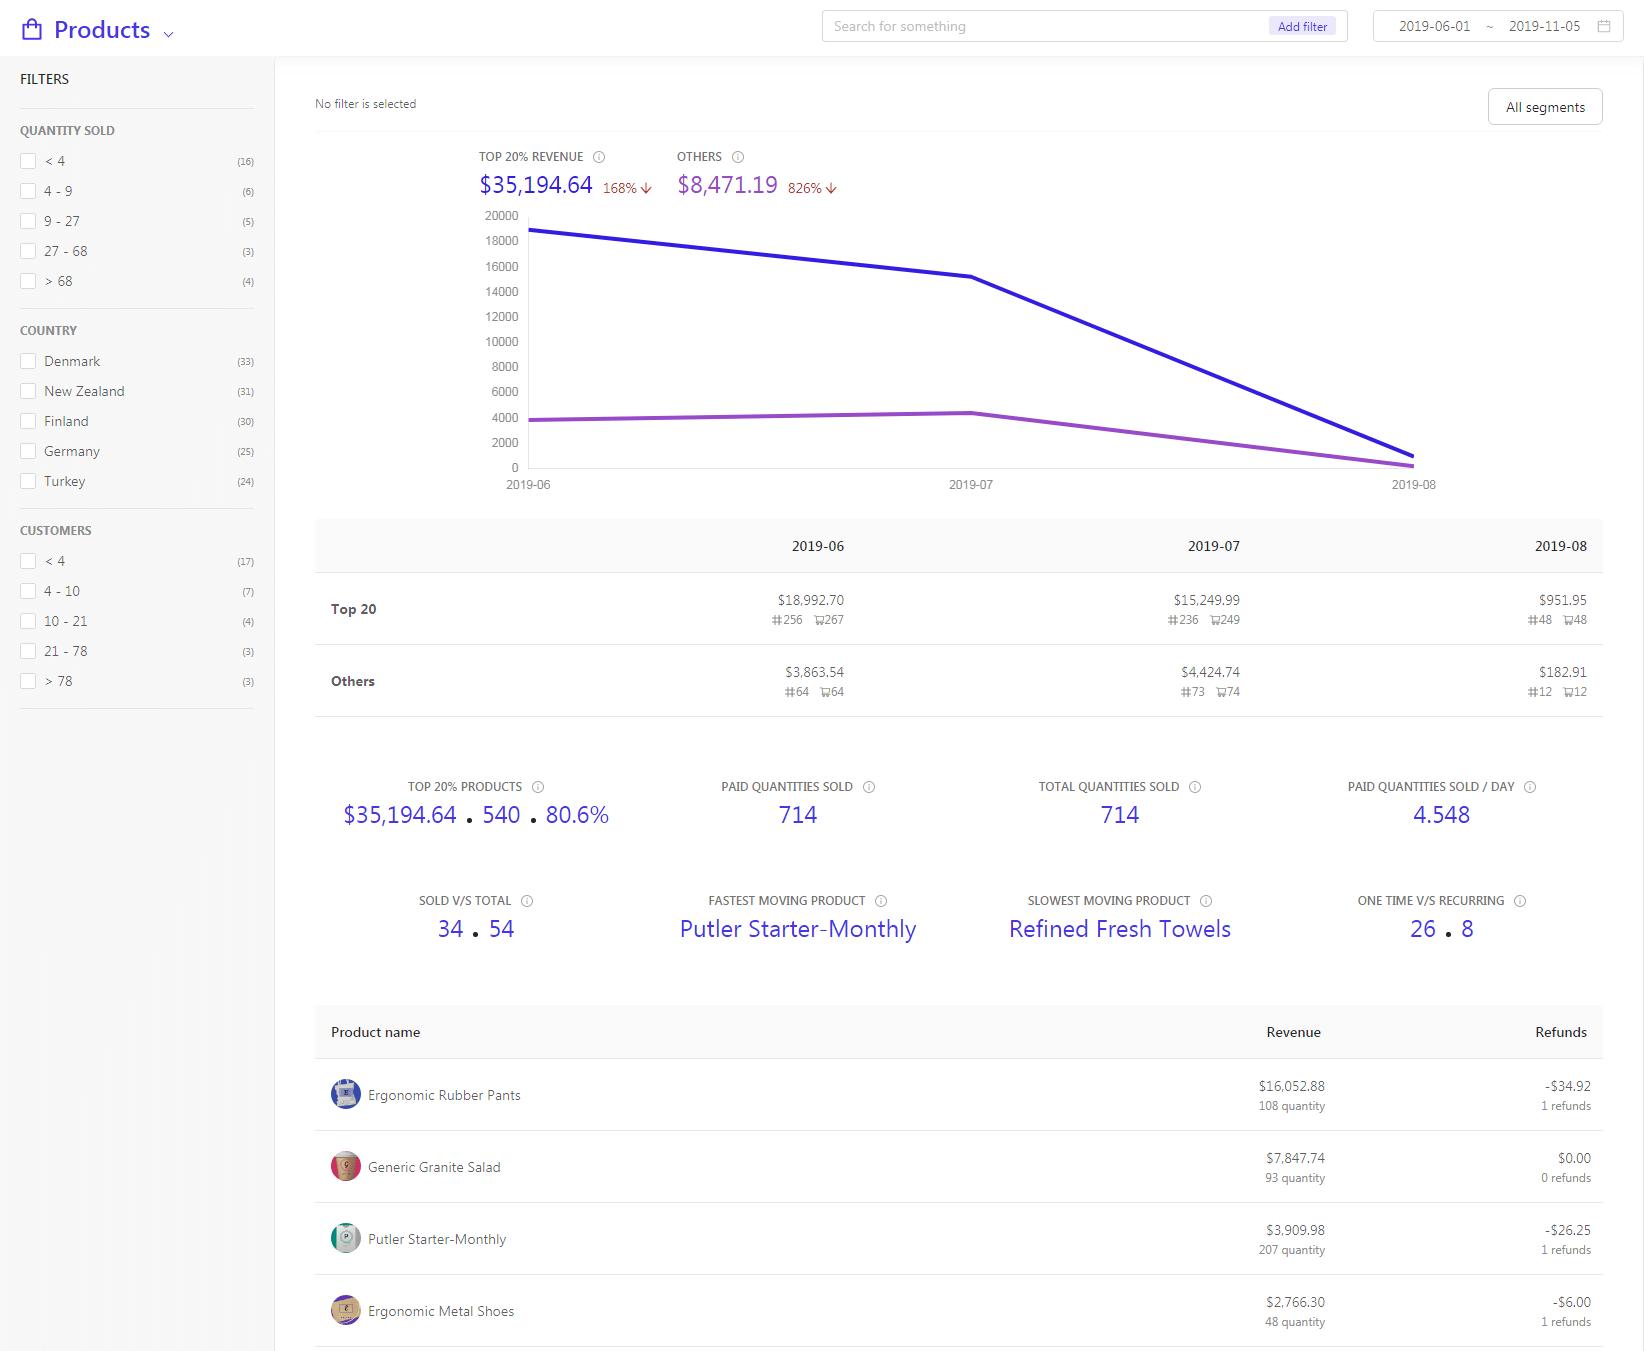 Products dashboard Macro Polo